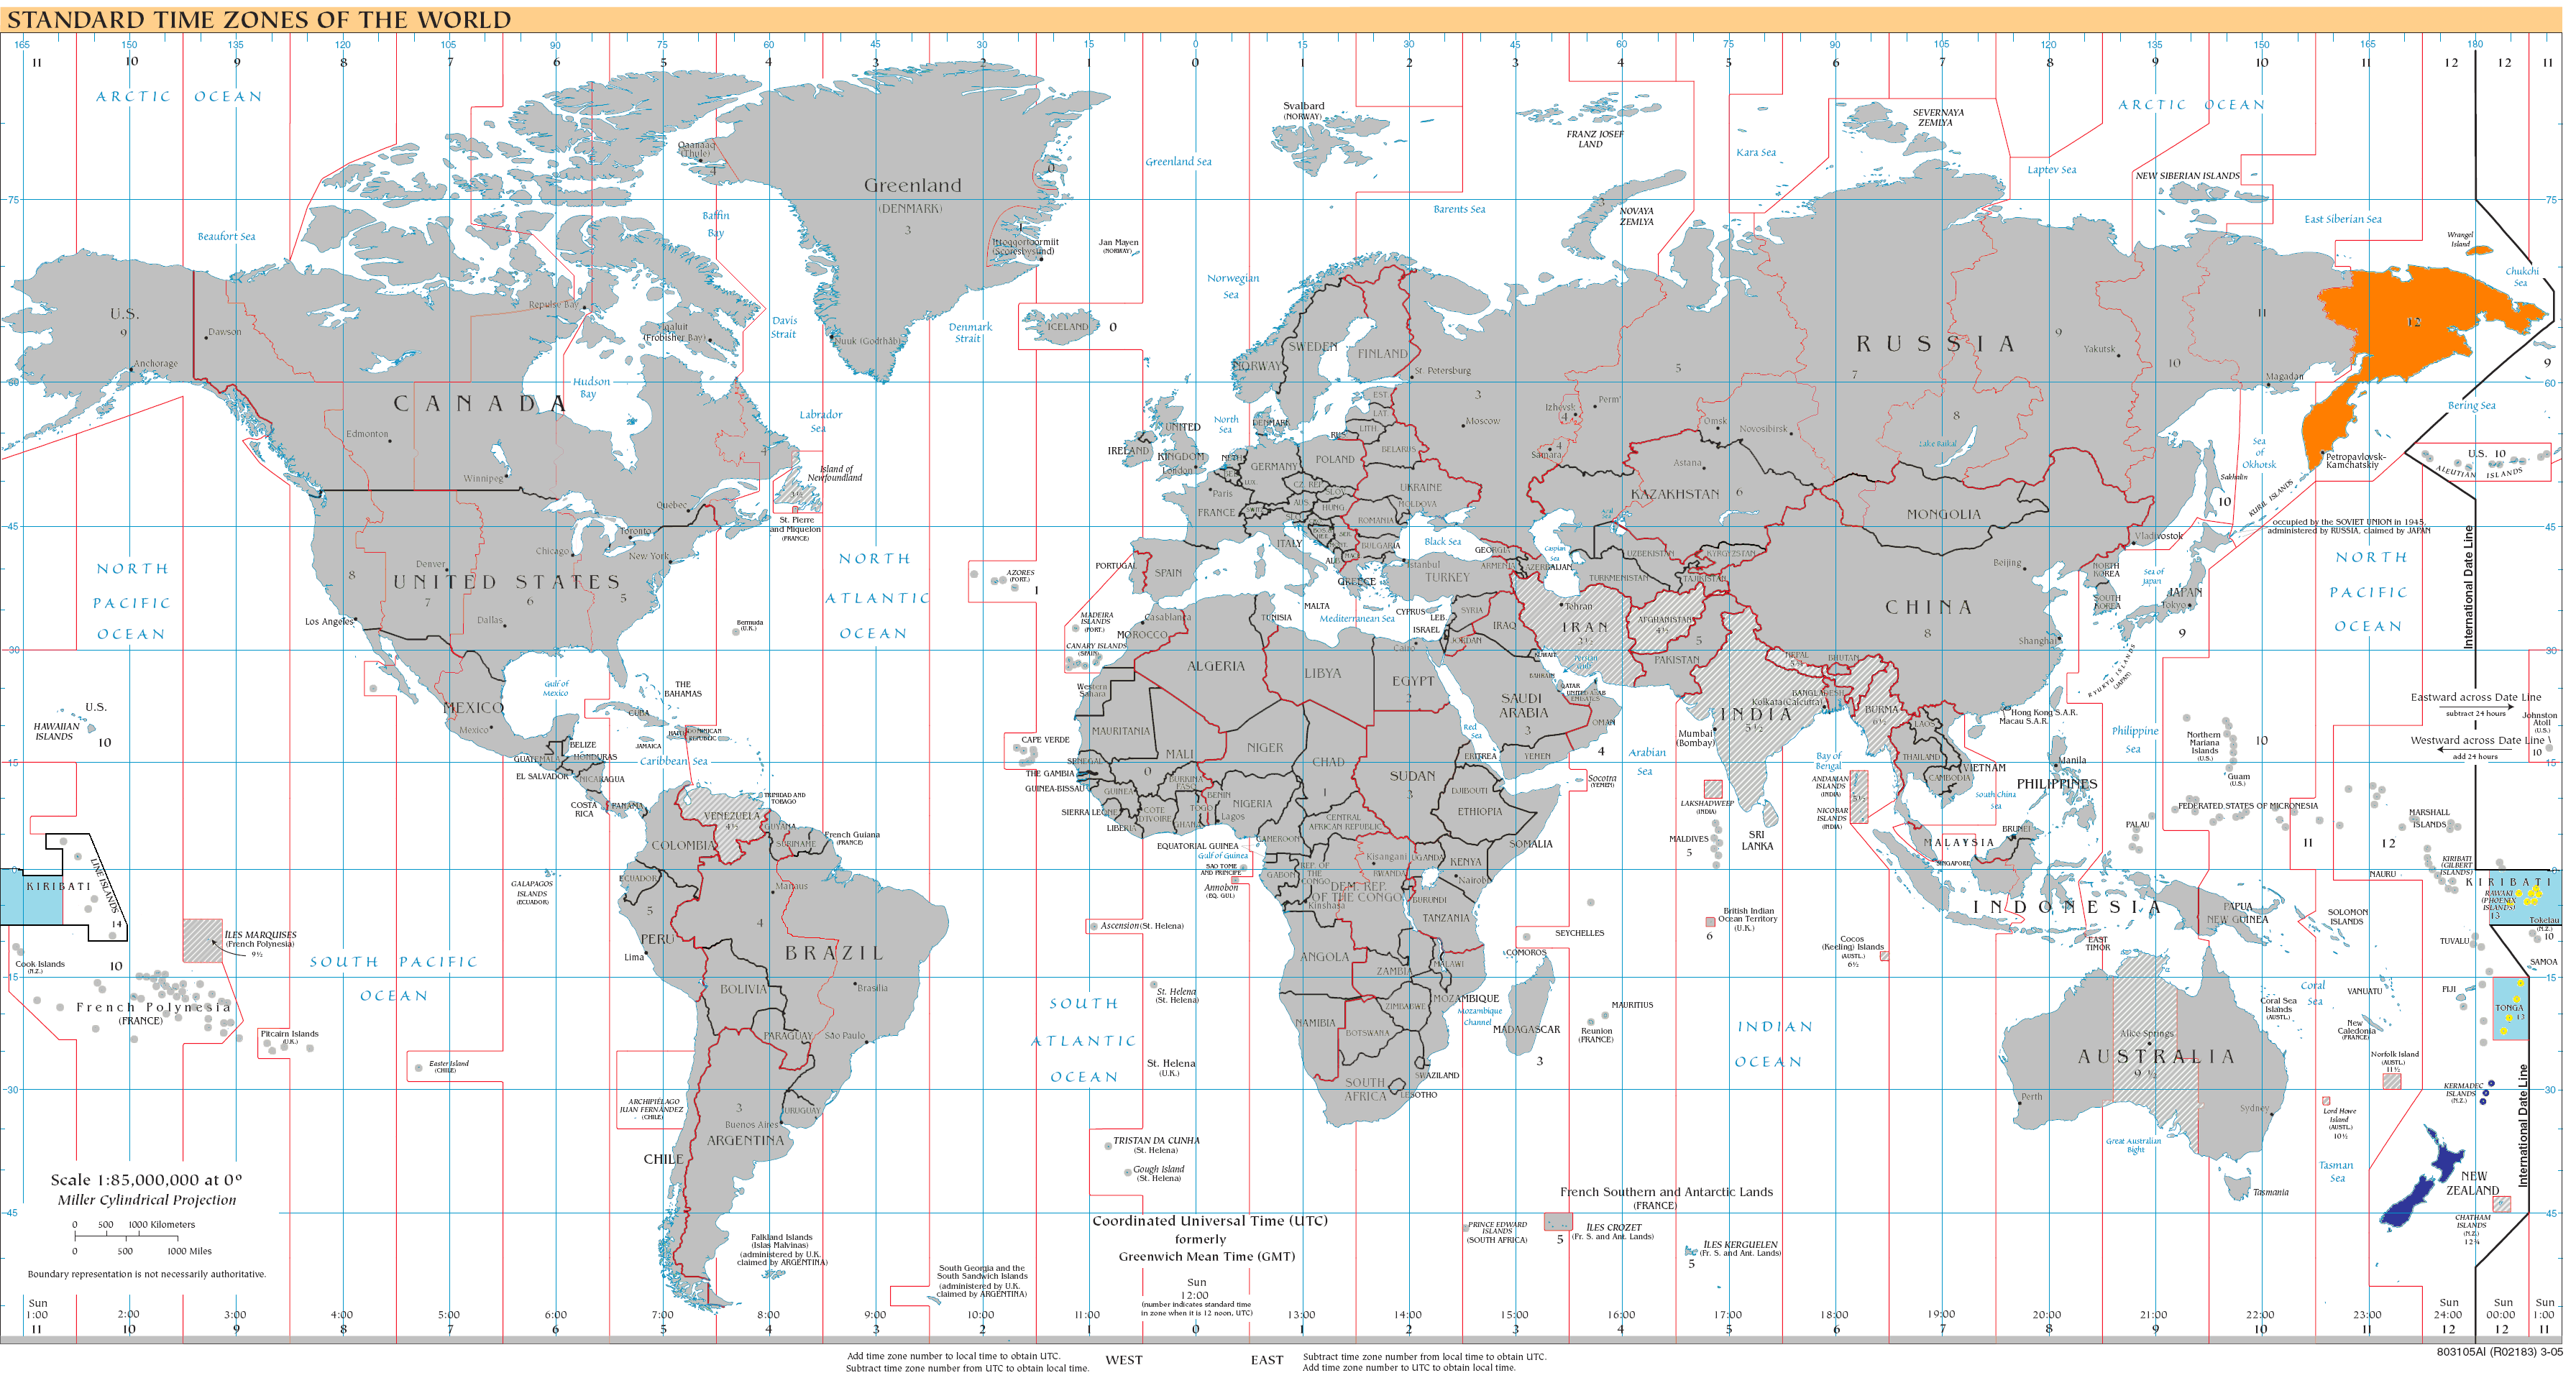 UTC+13:00 - Wikipedia on afghanistan time zone, west coast time zone, panama time zone, cuba time zone, east caribbean time zone, ecuador time zone, fiji time zone, oceania time zone, new zealand time zone, norfolk island time zone, indonesia time zone, aleutian time zone, saskatchewan time zone, pacific ocean time zone, georgia time zone, faroe islands time zone, monaco time zone, alaska time zone, portugal time zone, belize time zone,